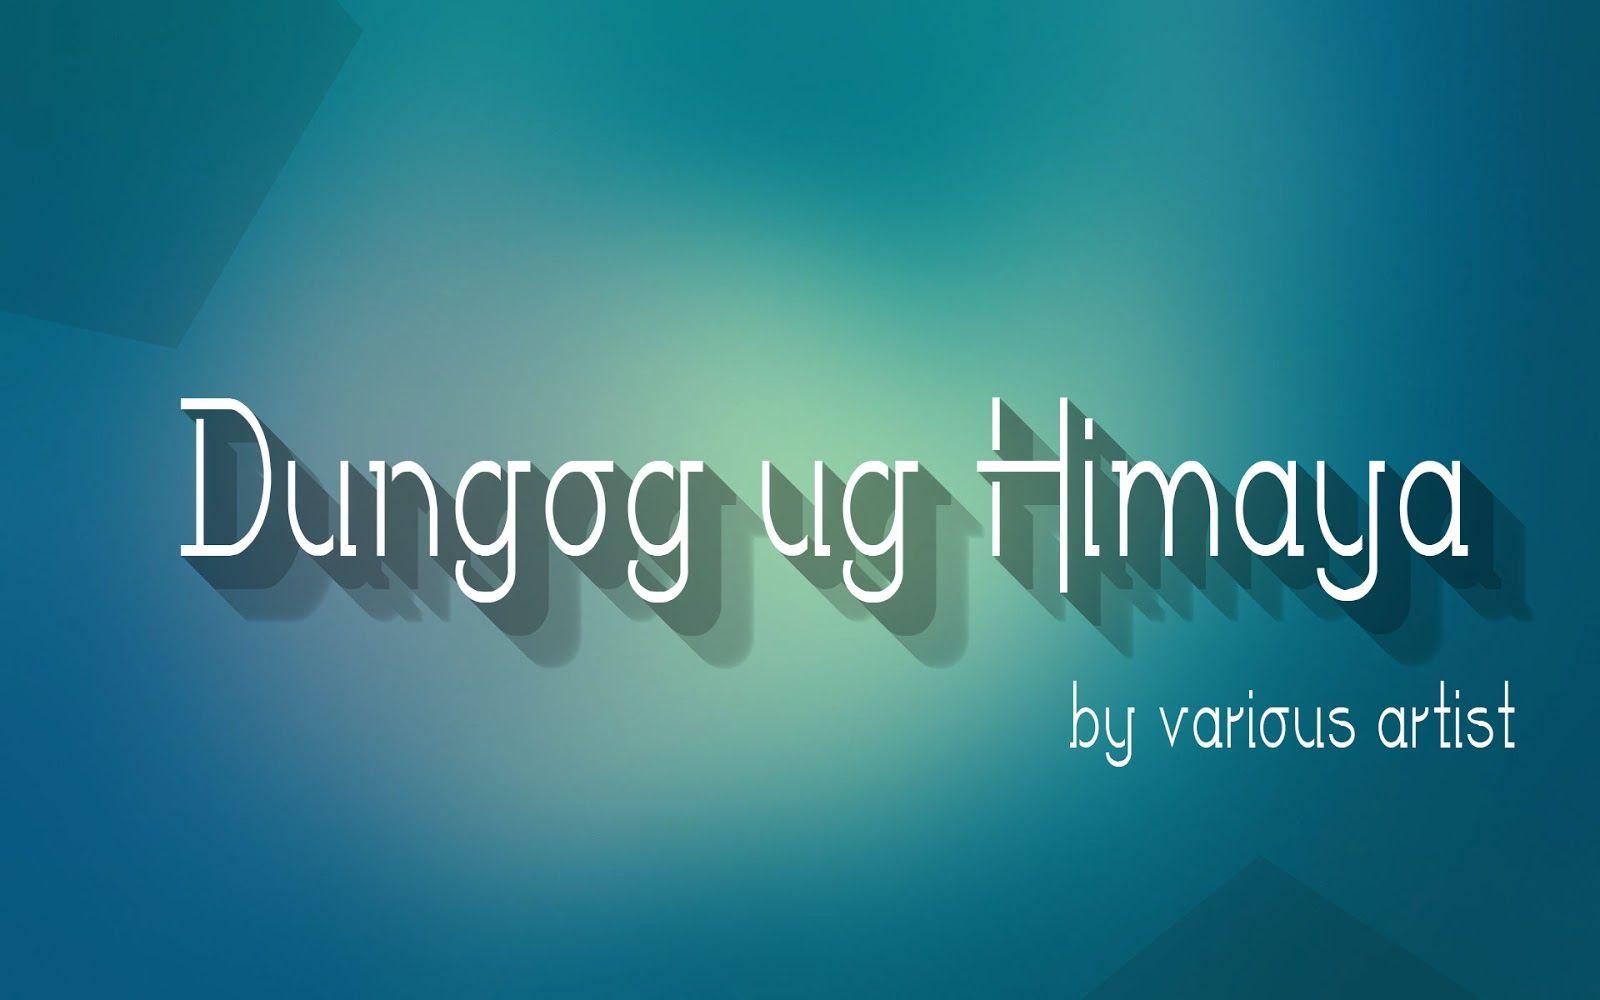 Dungog Ug Himaya By Various Artist Pinterest Guitar Chords